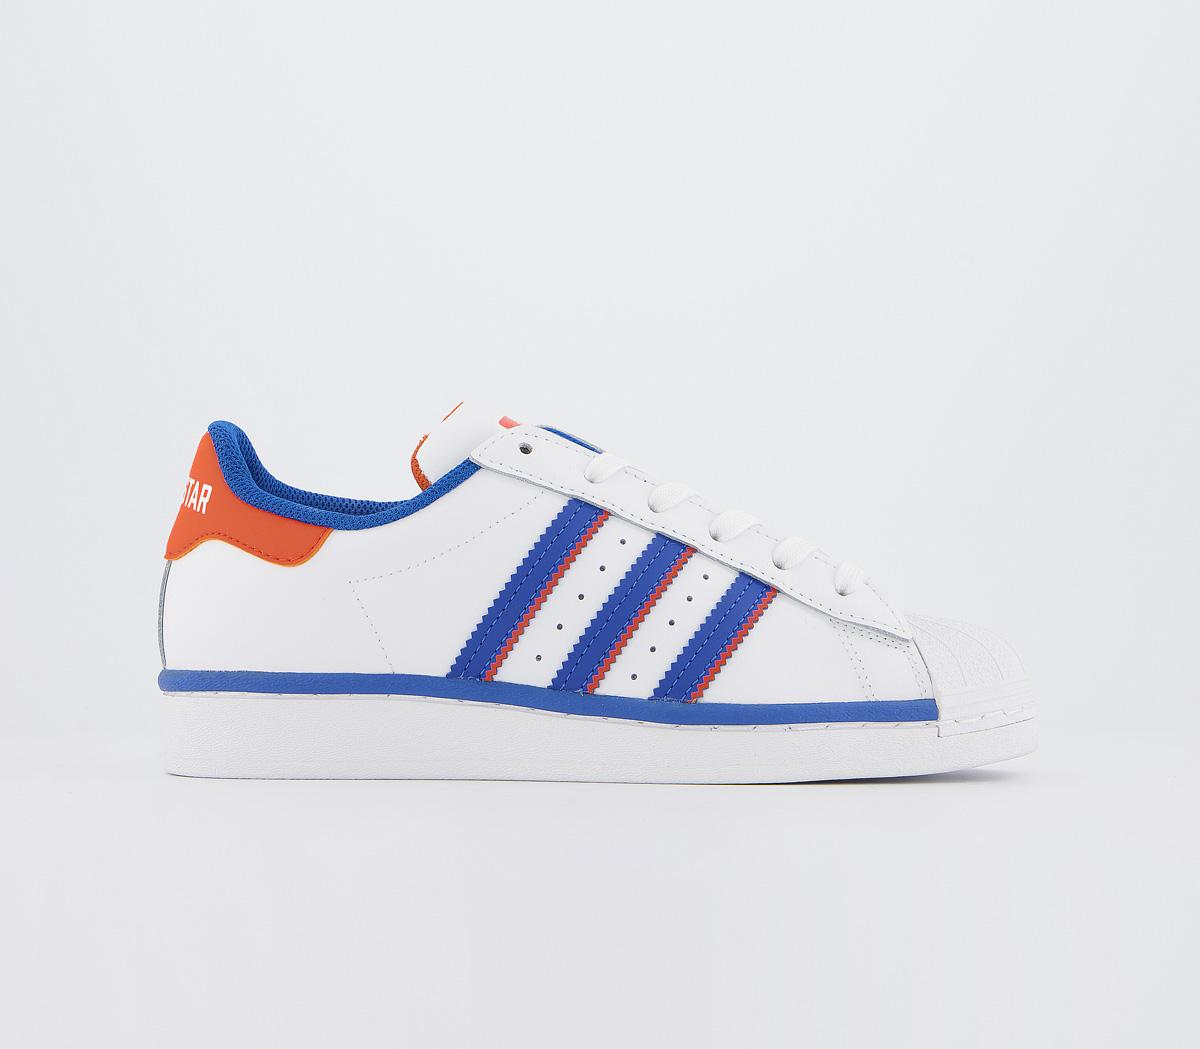 adidas superstar blue and orange stripes